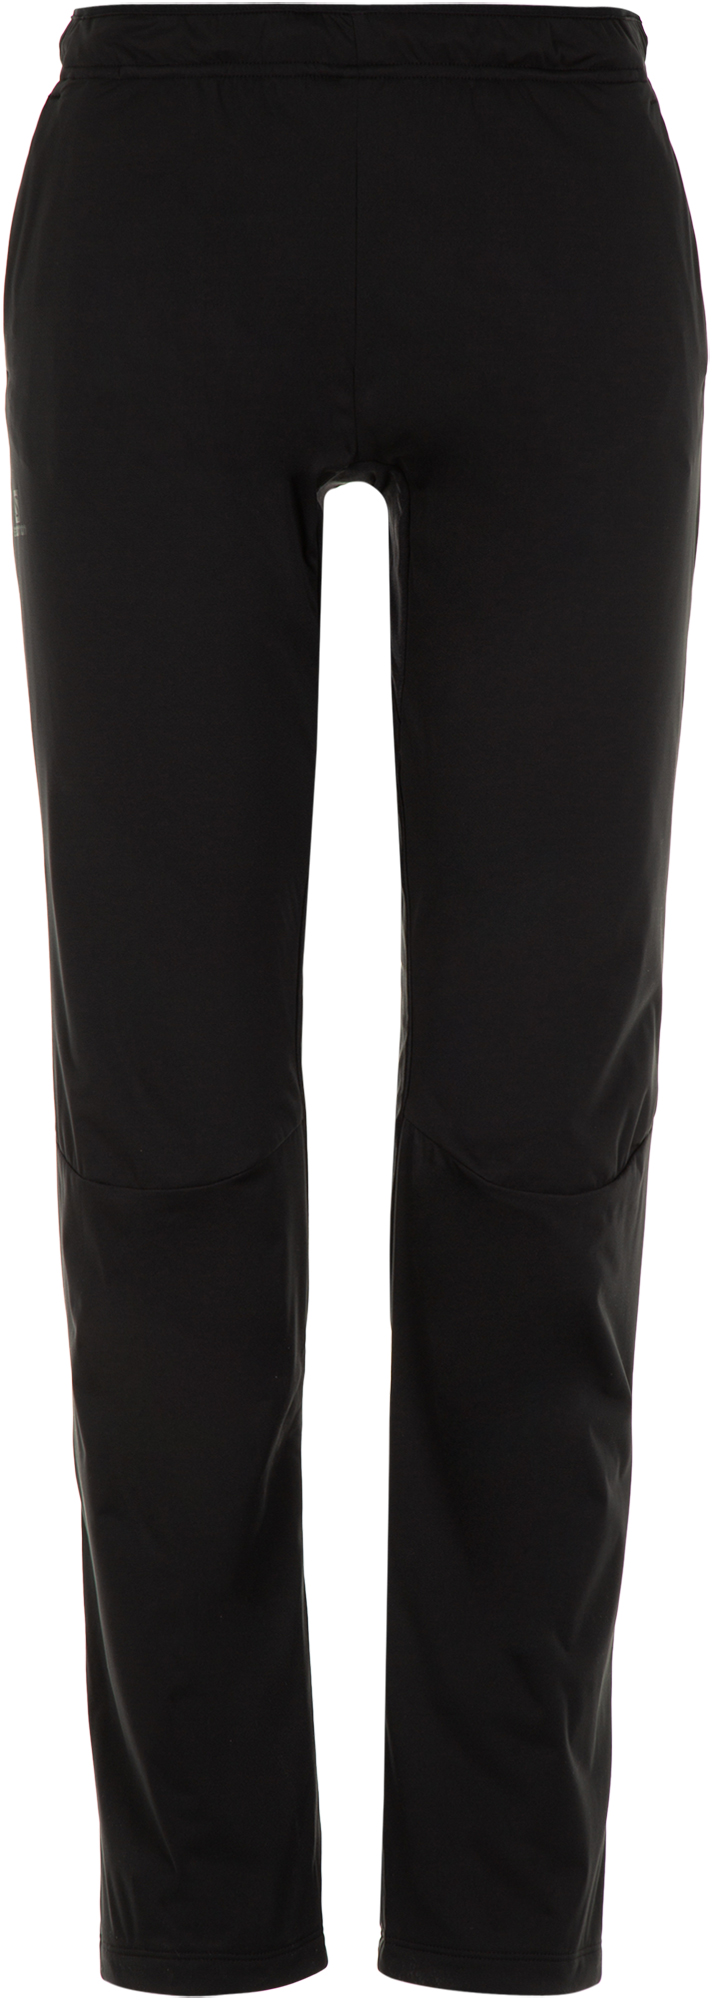 Salomon Брюки женские Salomon, размер 42-44 брюки salomon salomon response женские